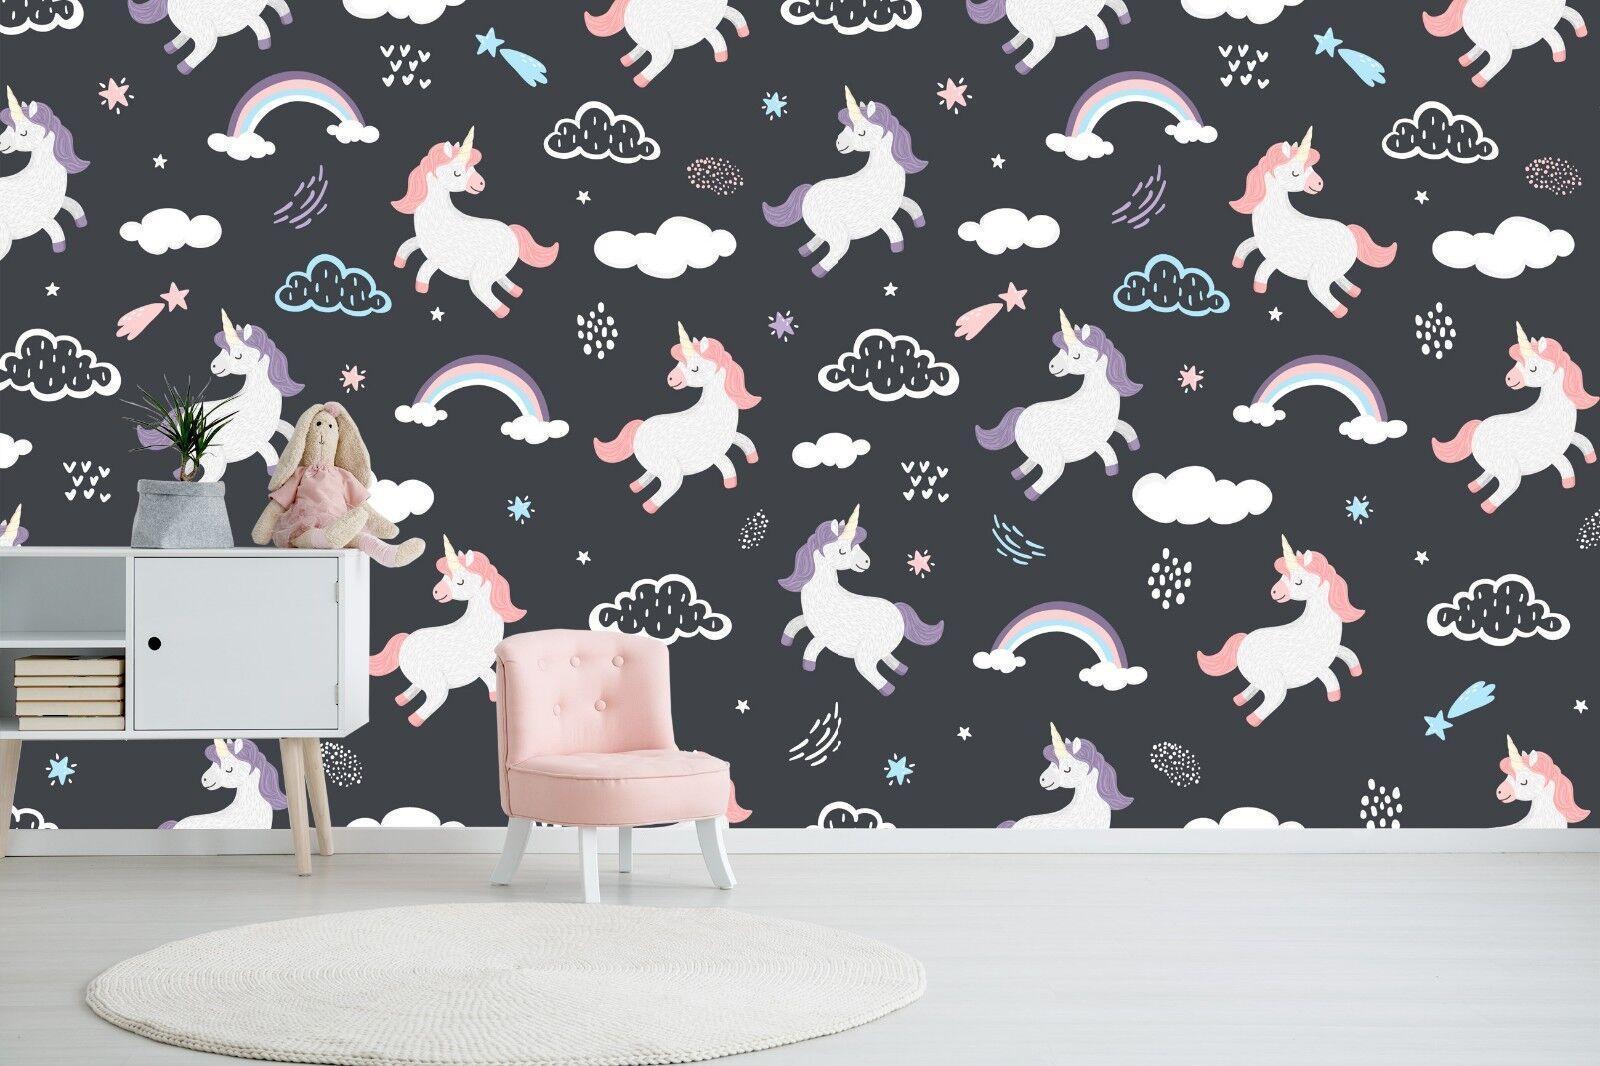 3D Rainbow Unicorn Sky 45 Wallpaper Murals Wall Print Wallpaper Mural AJ WALL AU